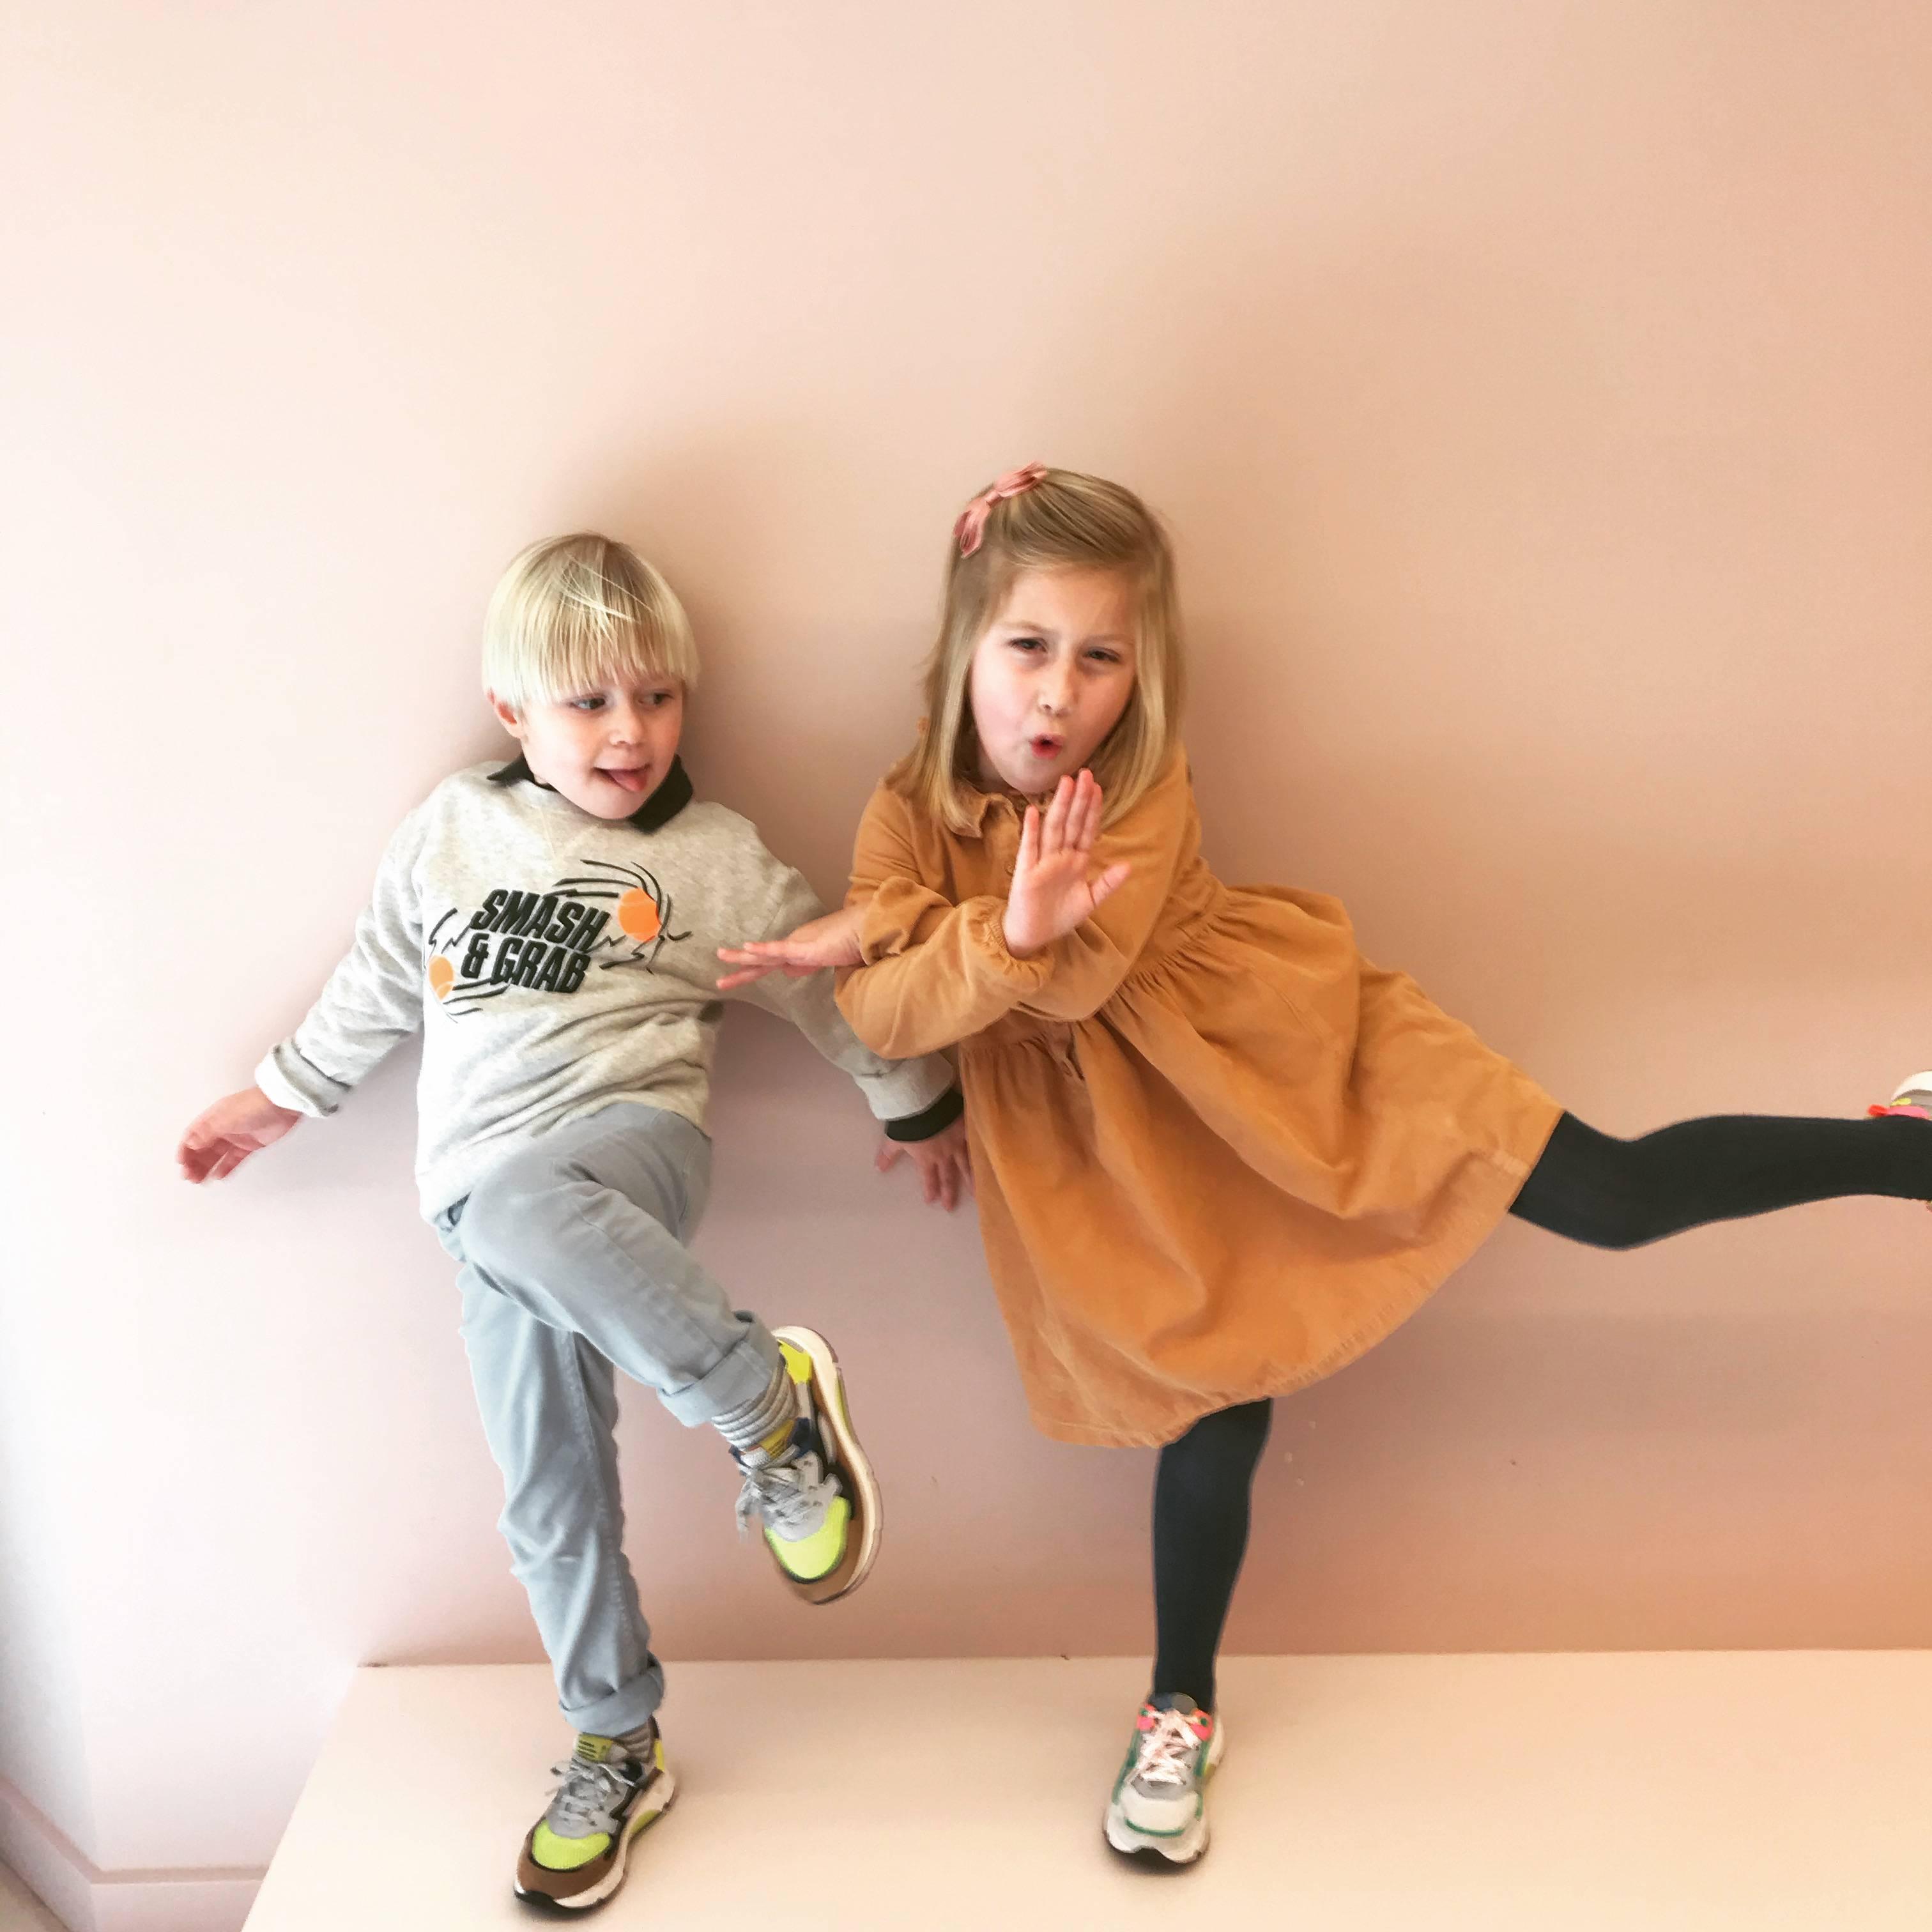 Brilliant shoes for sparkling kids!